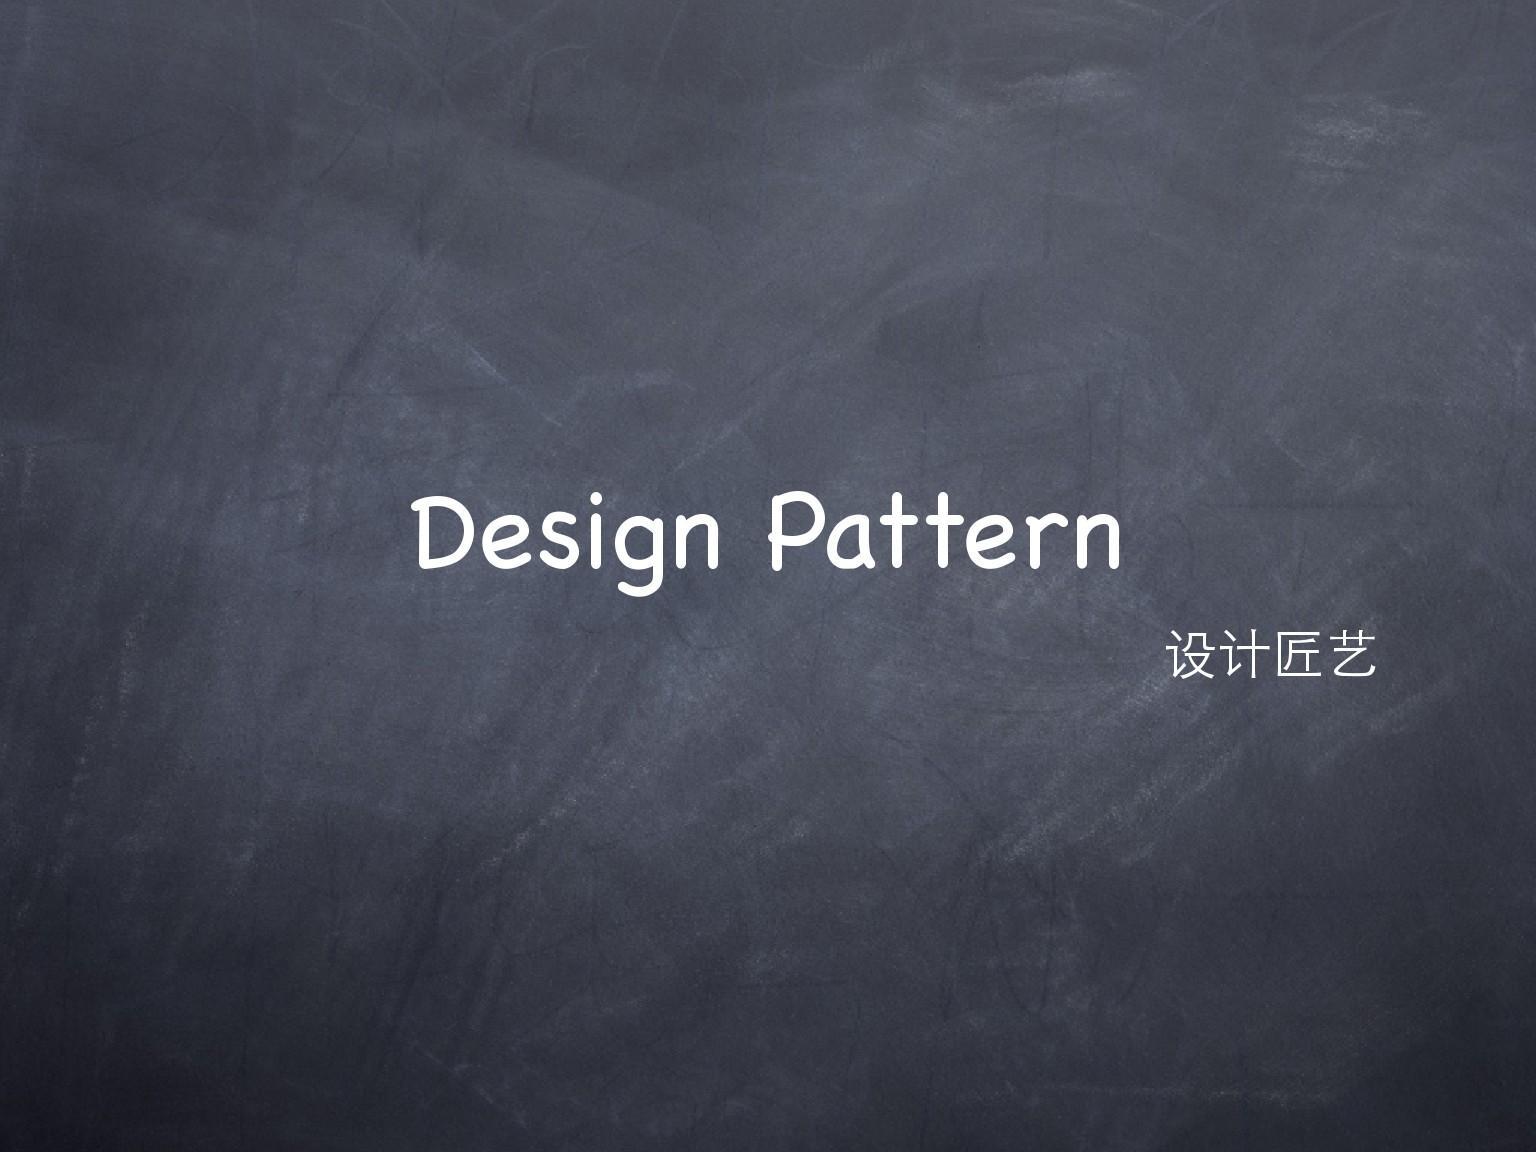 design pattern 设计匠艺图片